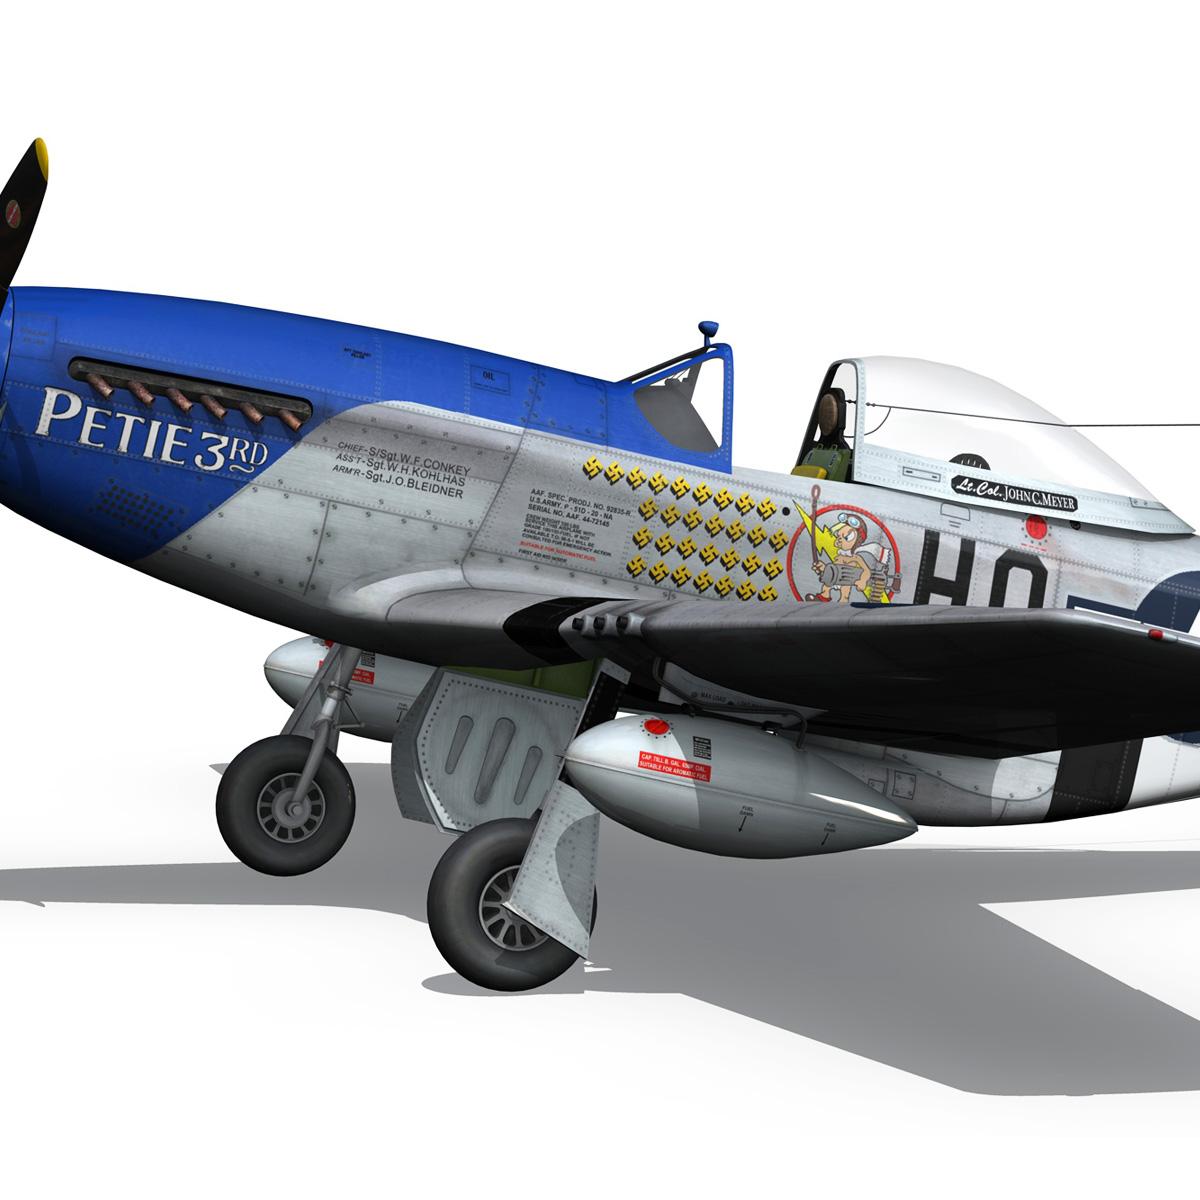 north american p-51d mustang – petie 3rd 3d model fbx c4d lwo obj 280137